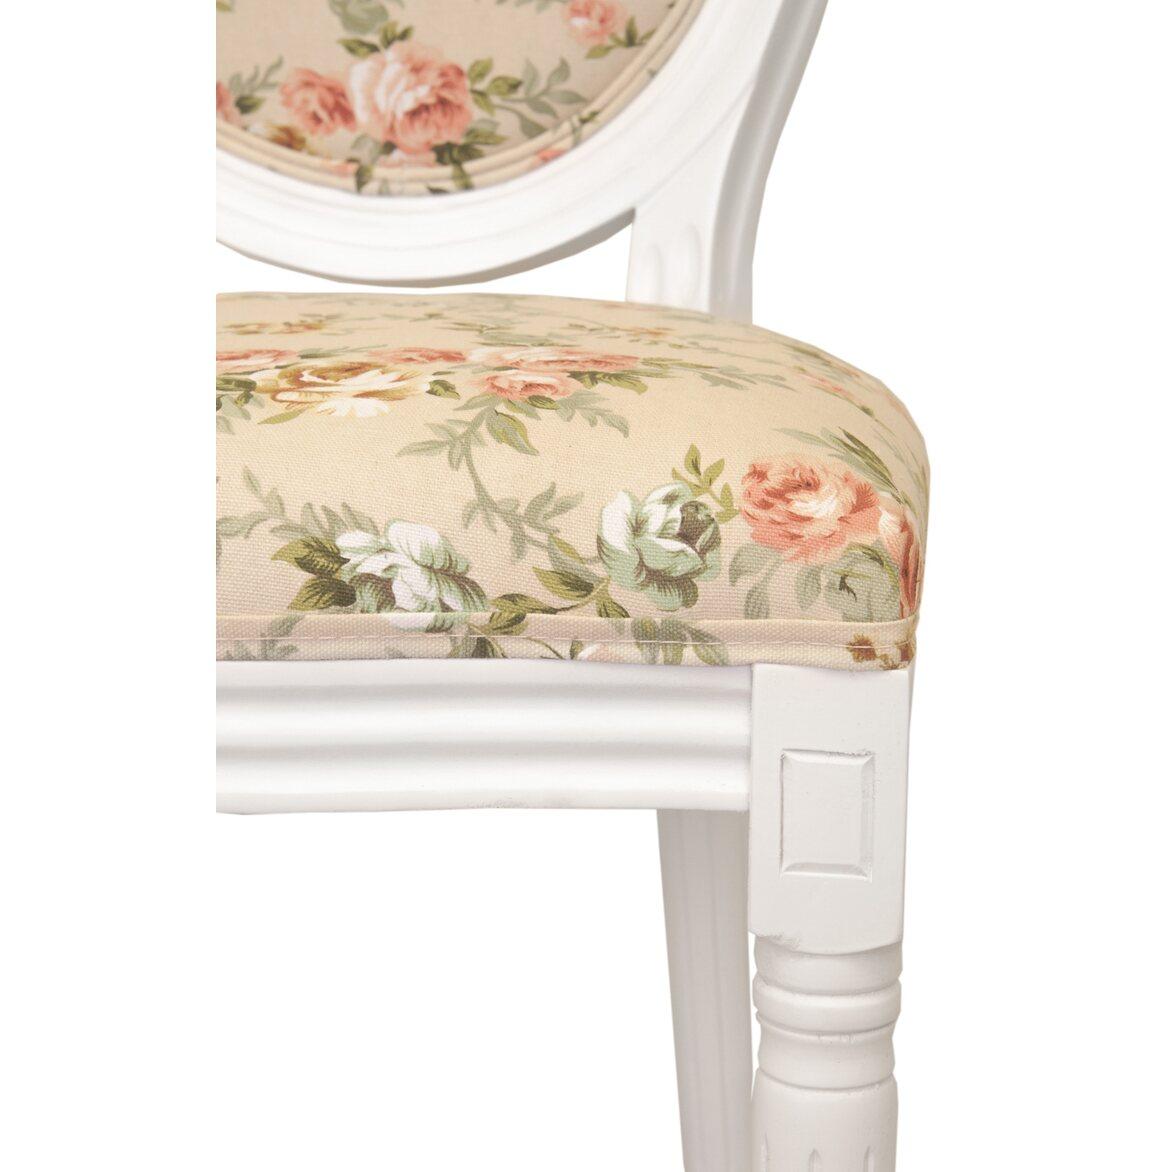 Стул Volker flower 5 | Обеденные стулья Kingsby